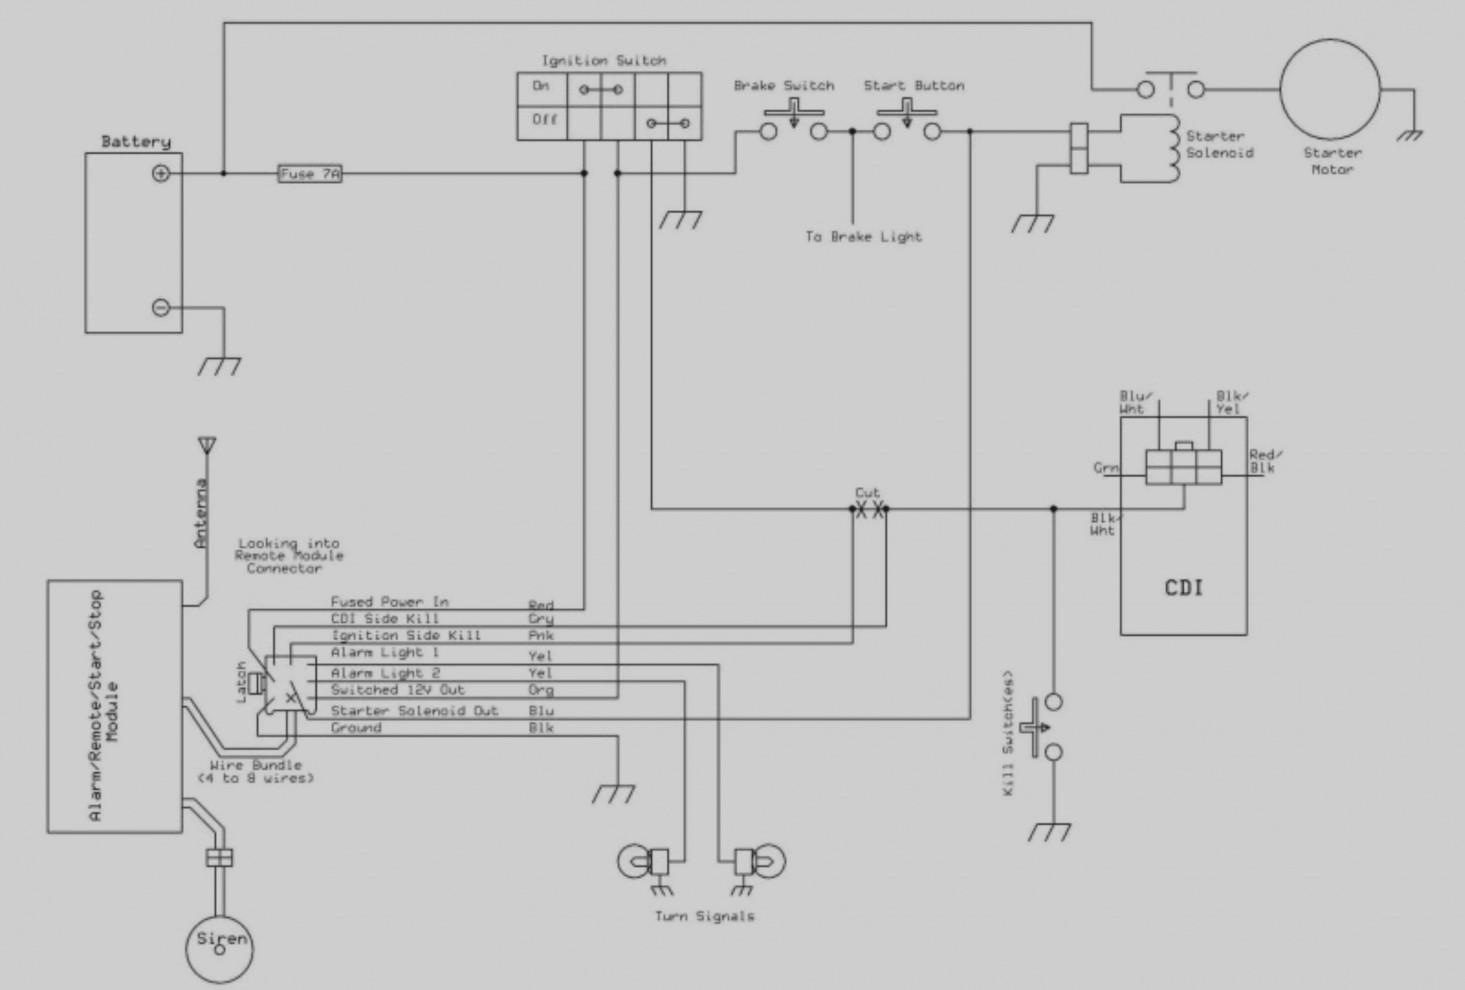 [SCHEMATICS_4ER]  Go Kart Wire Schematic - lan1.calc4web.de | Buggy Wiring Harness Gy6 150cc Chinese Electric Start Kandi Go |  | Diagram Source